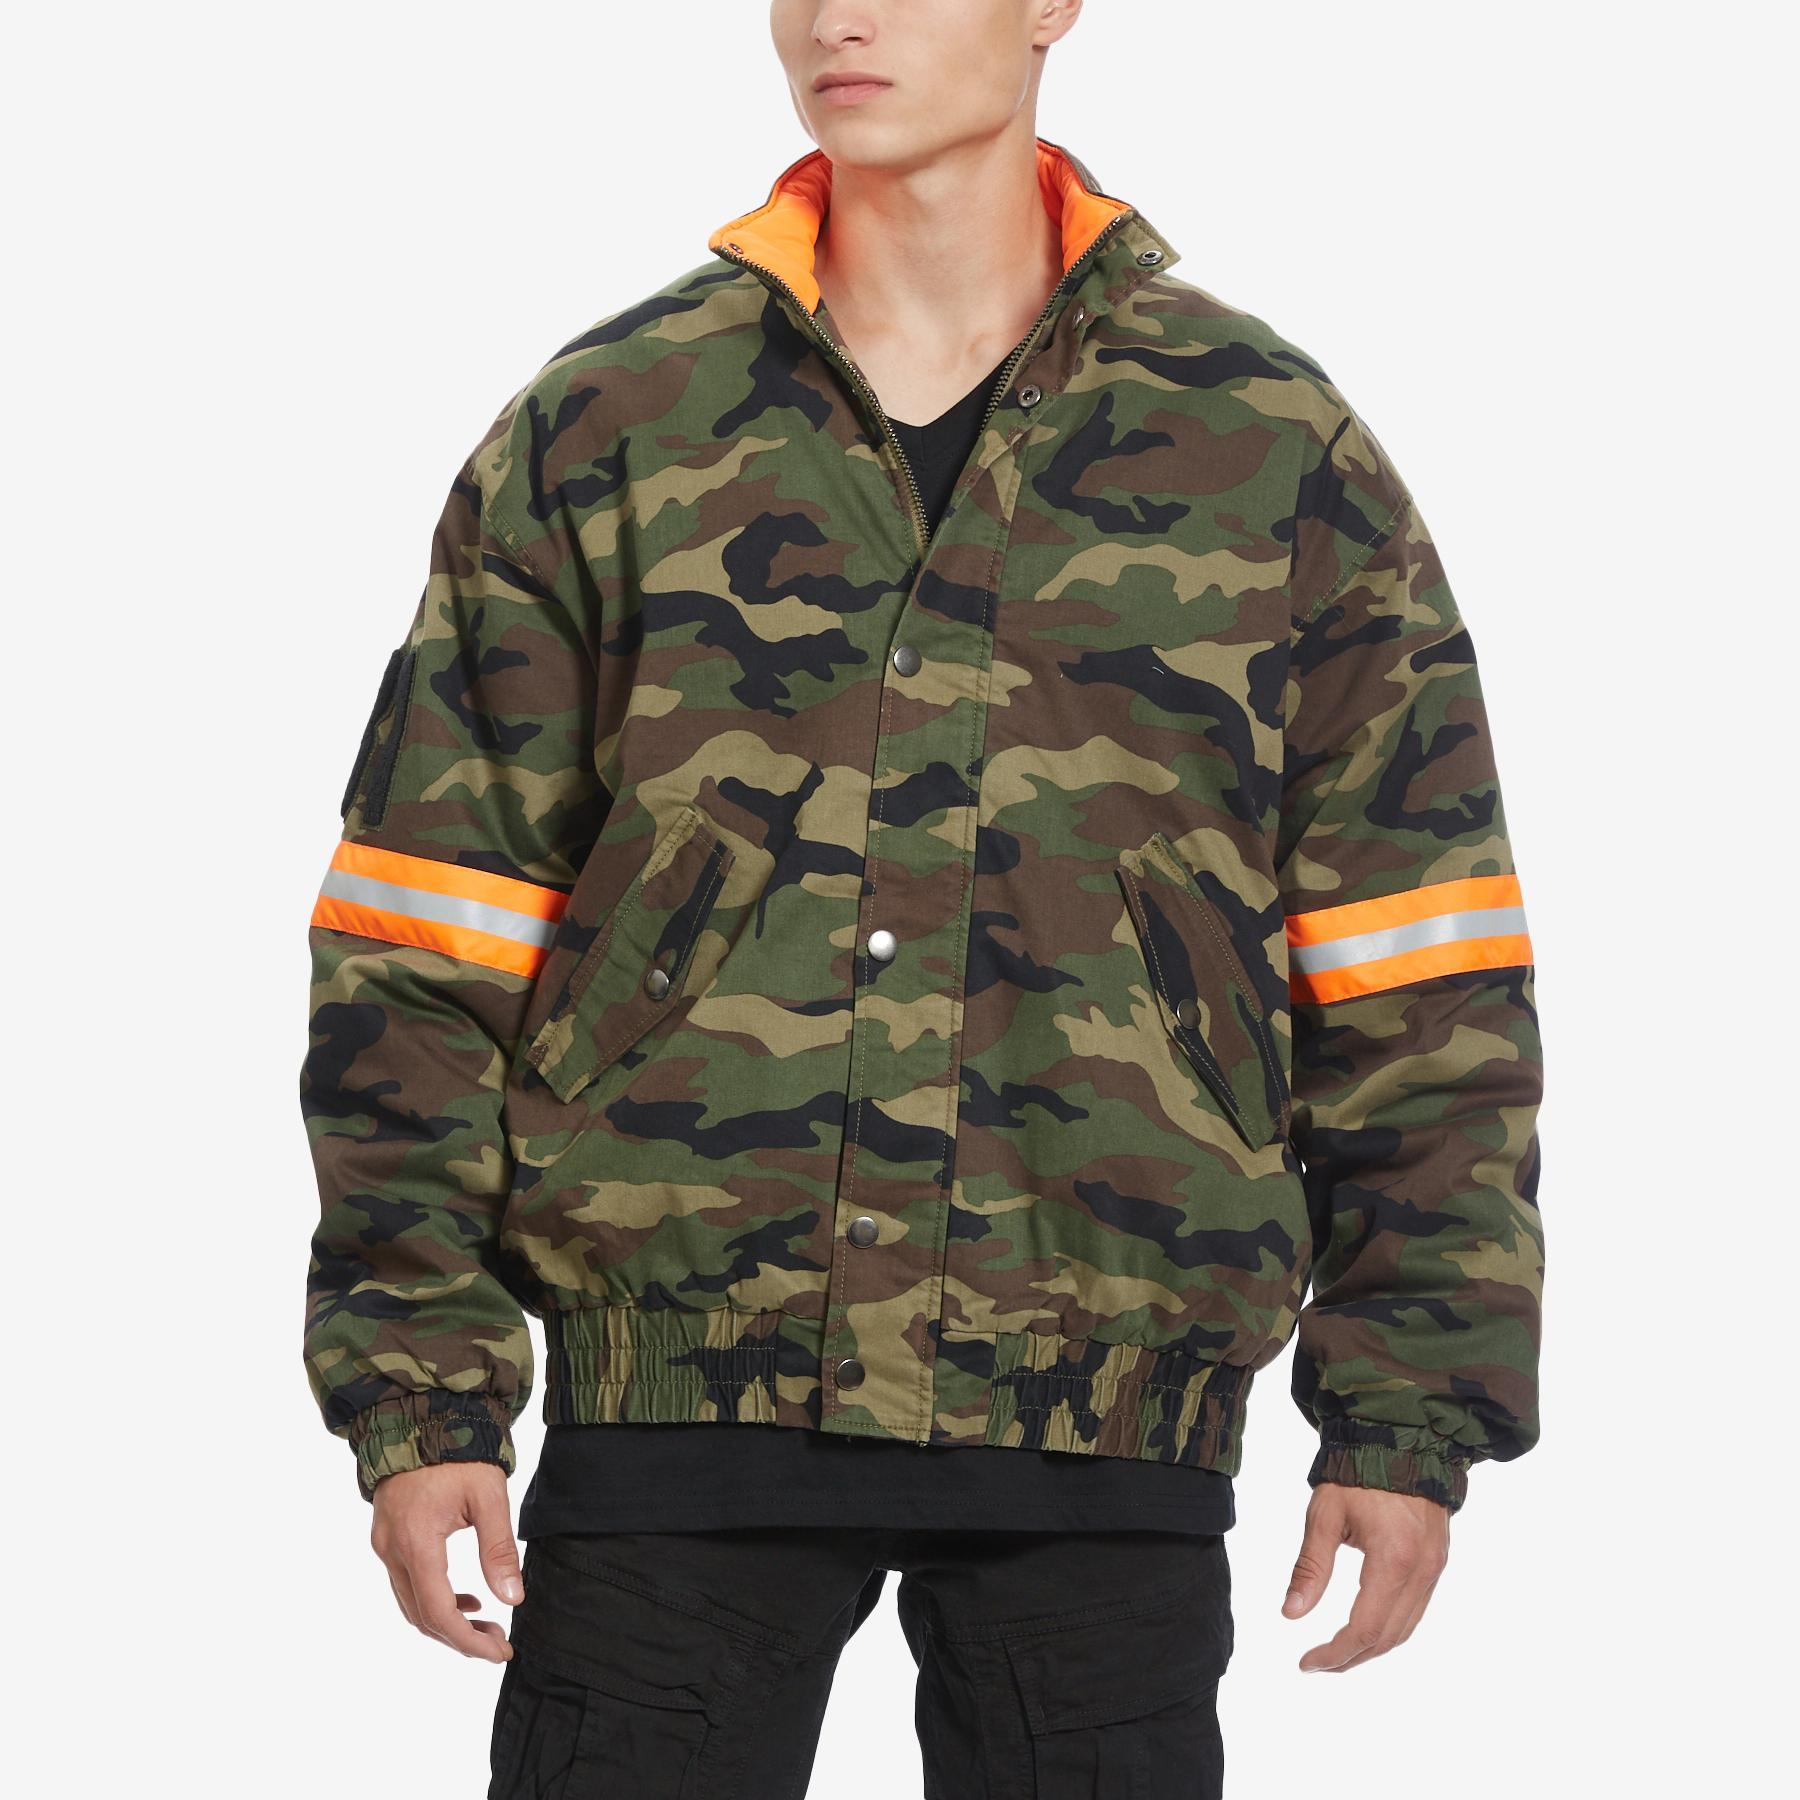 Carter Reflective Camo Bomber Jacket